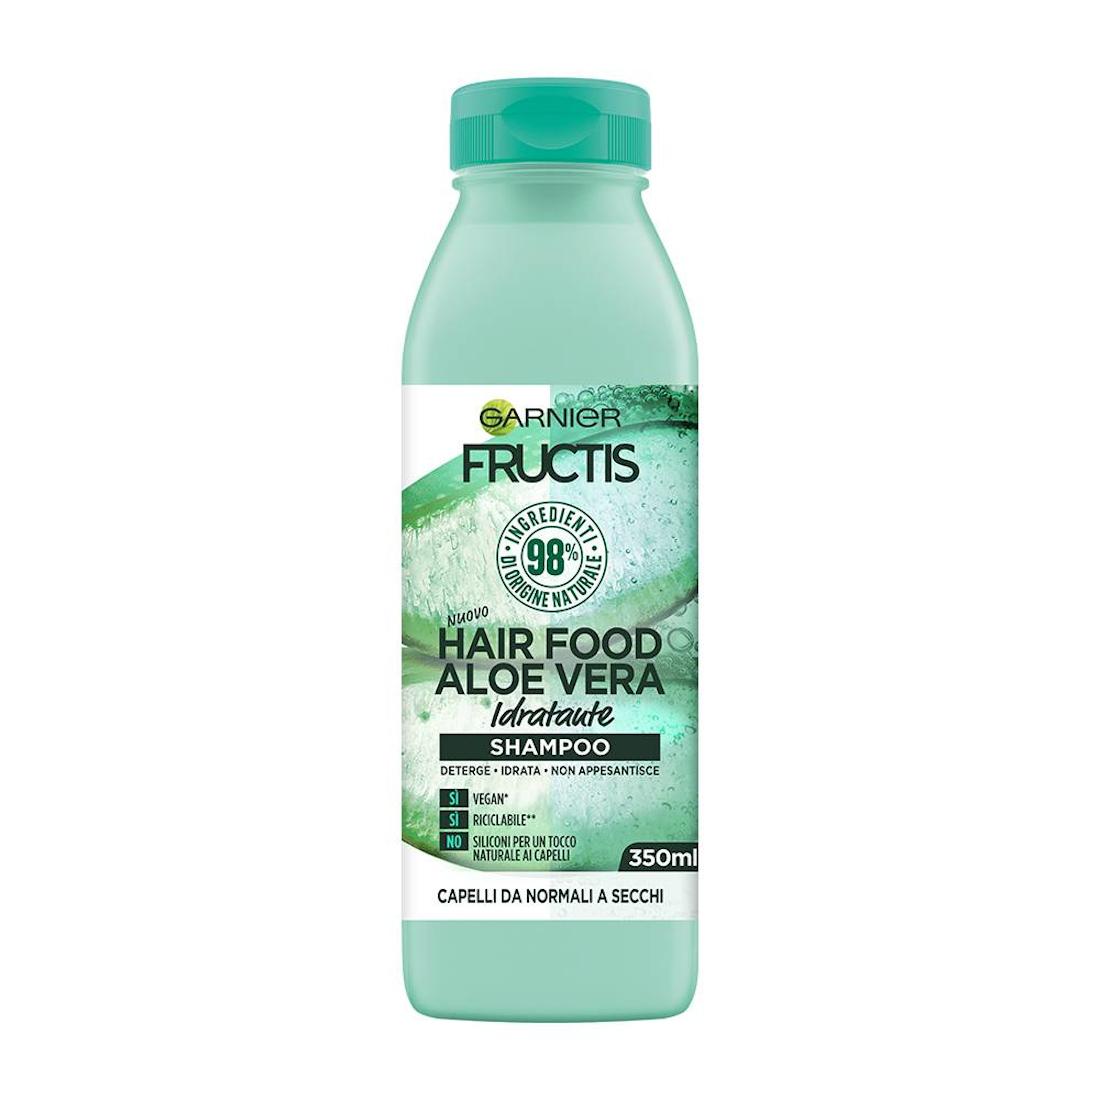 FRUCTIS Shampoo Hair Food Aloe Vera Idratante 350ml